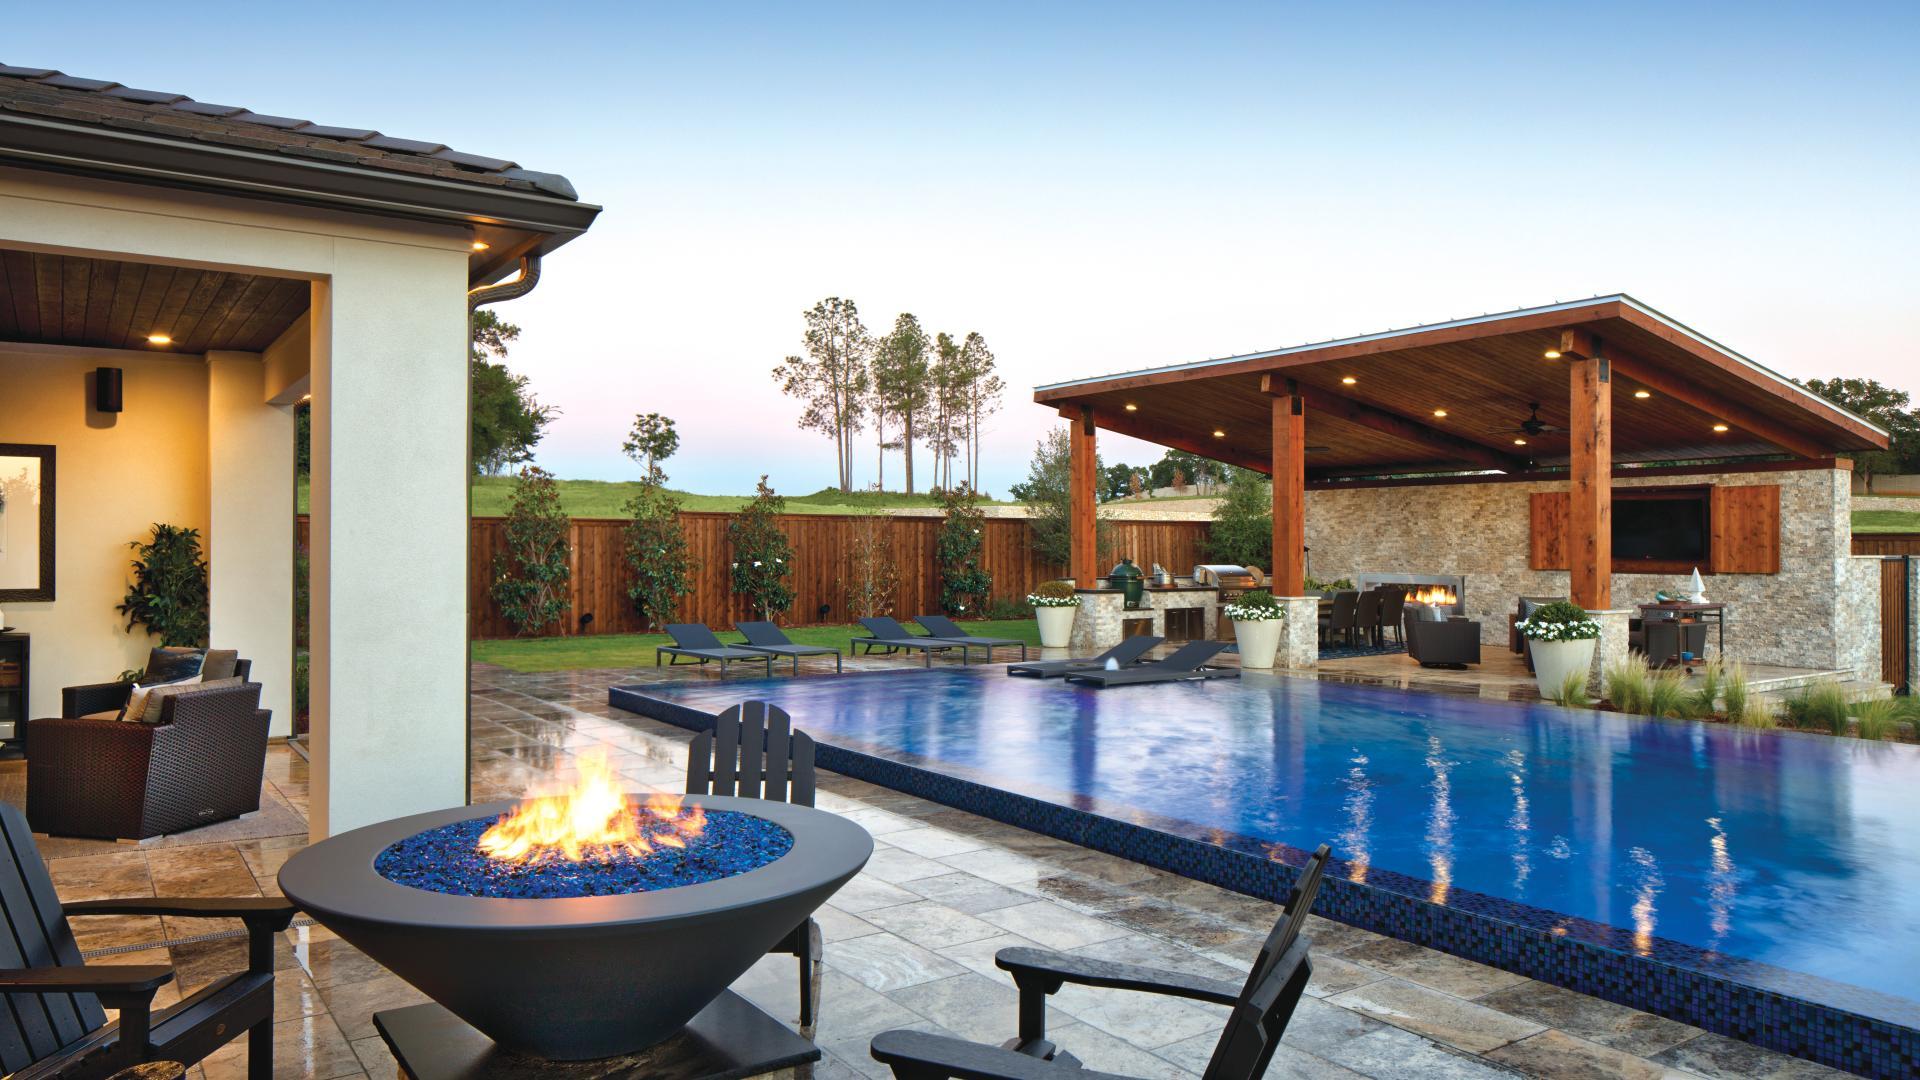 Ample space to create an idyllic backyard retreat